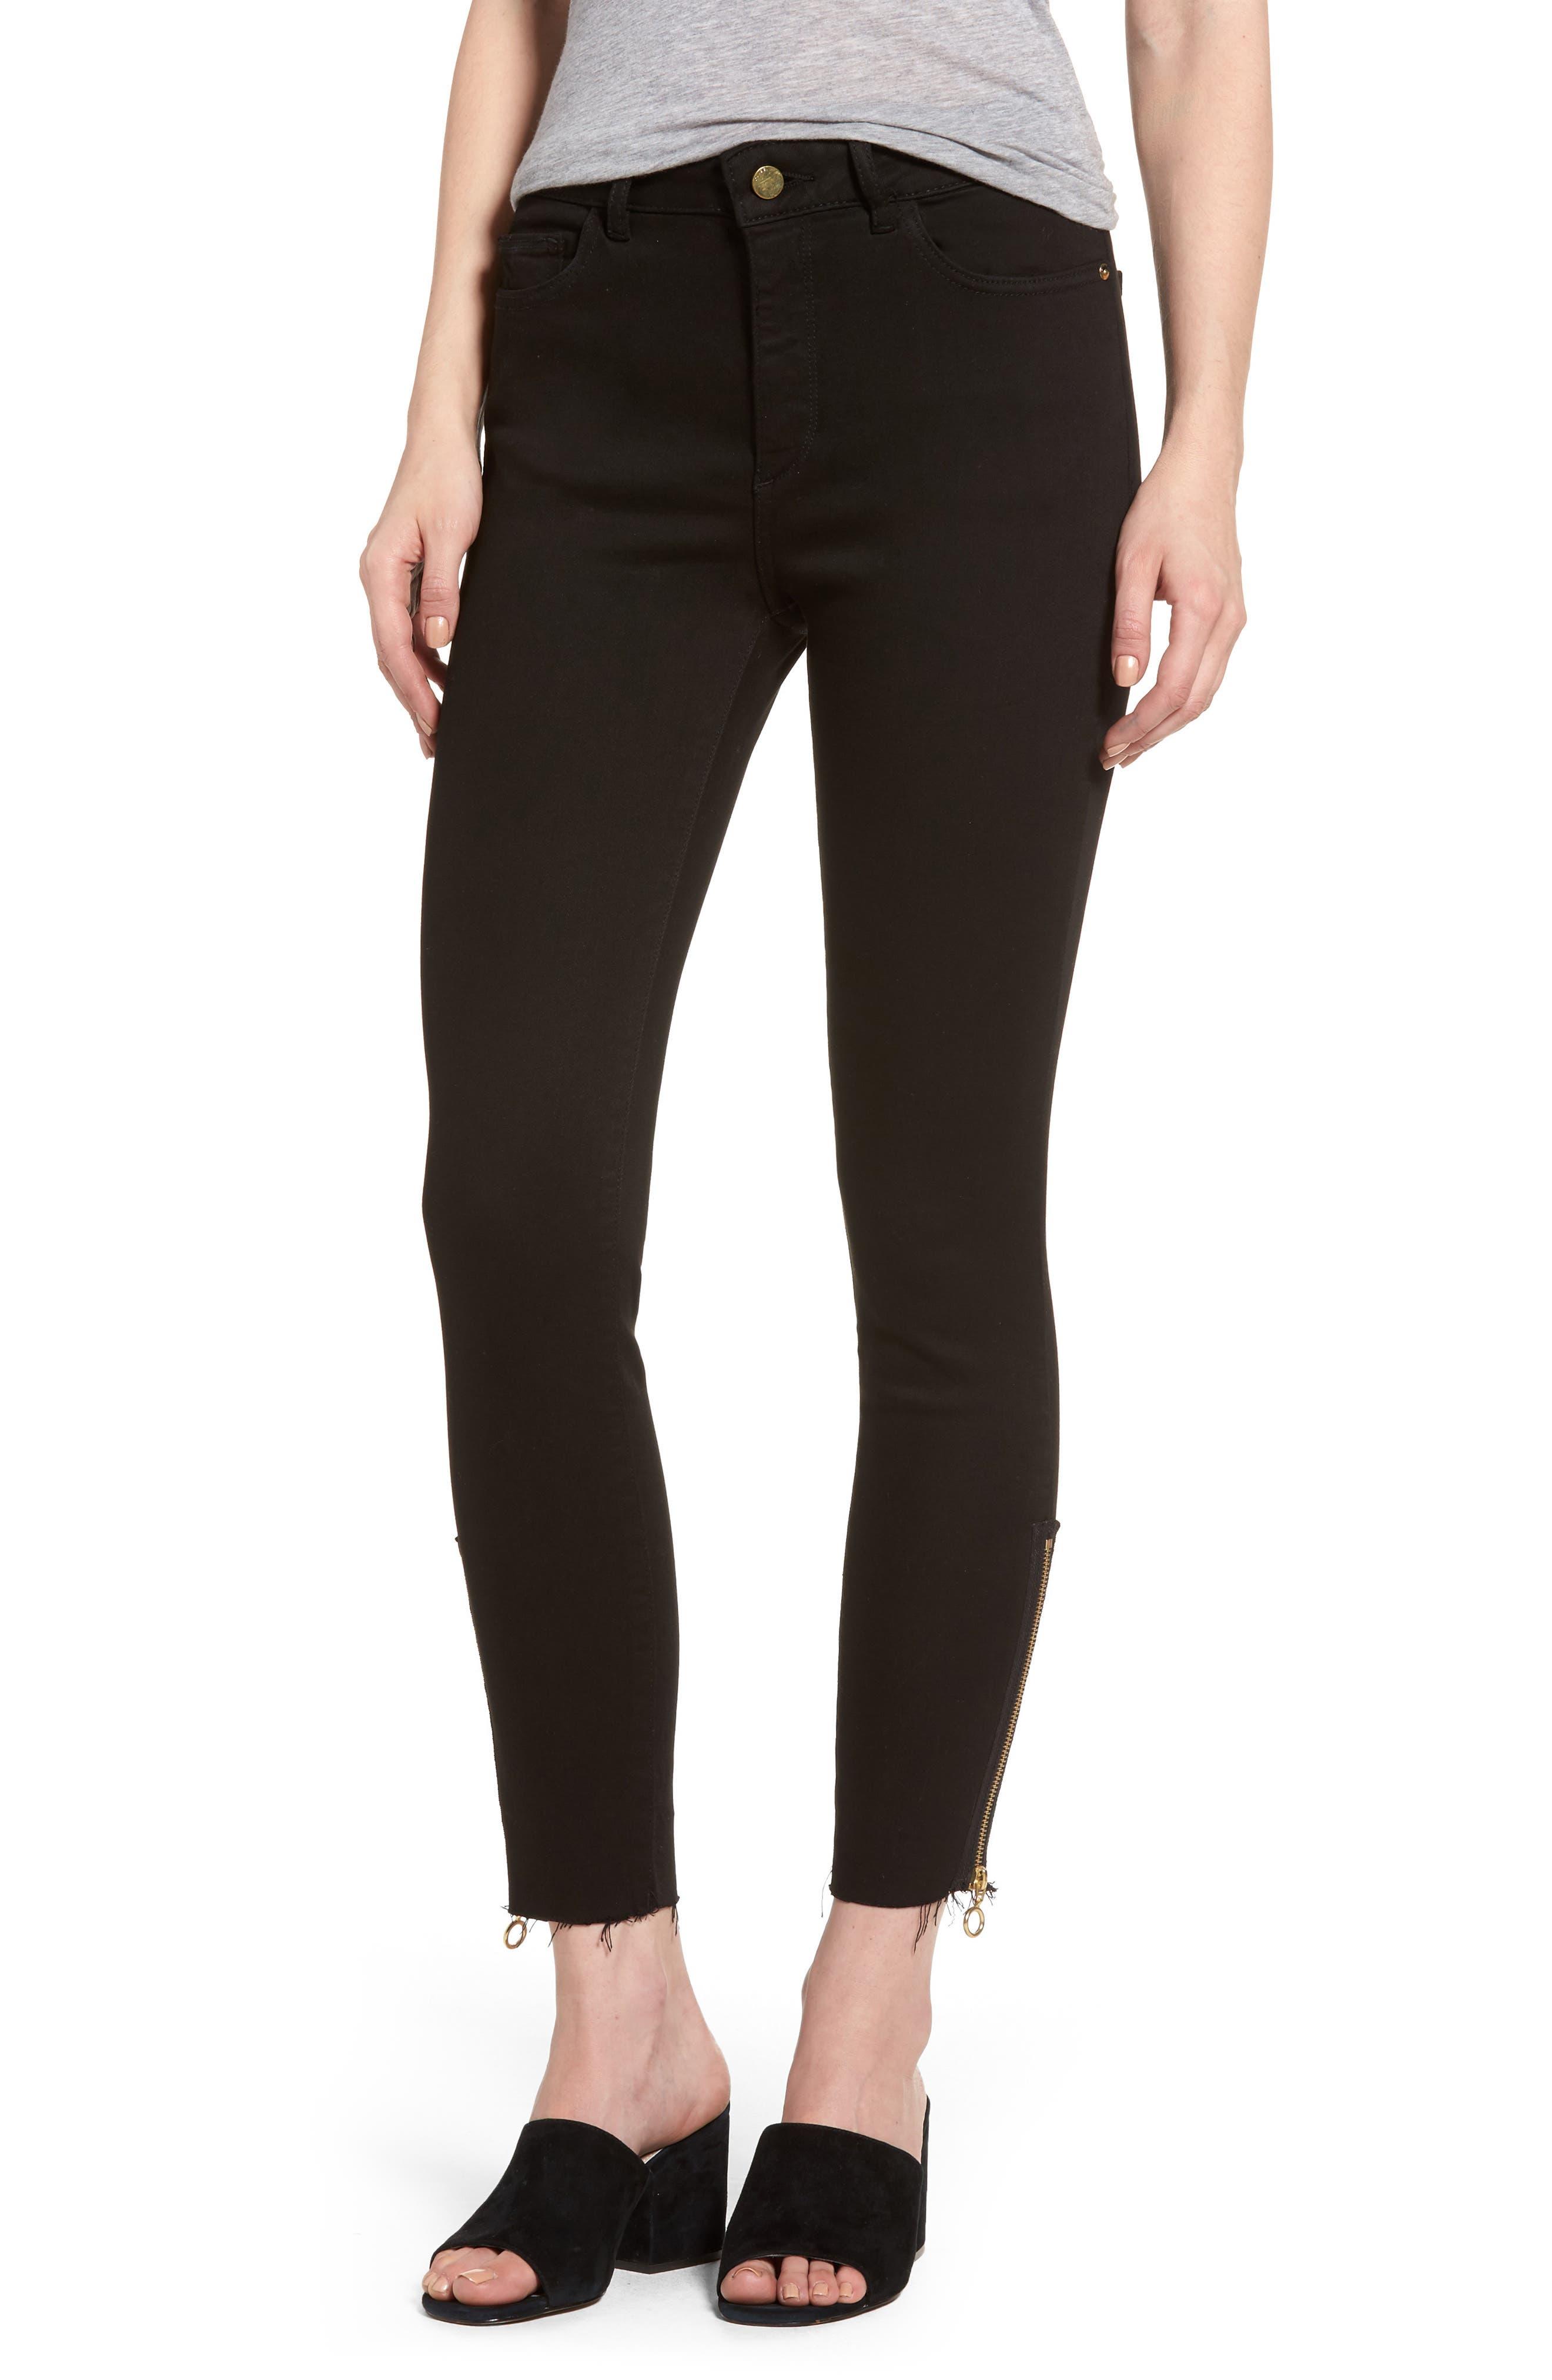 Main Image - DL1961 Farrow Instaslim High Waist Ankle Skinny Jeans (Medway)